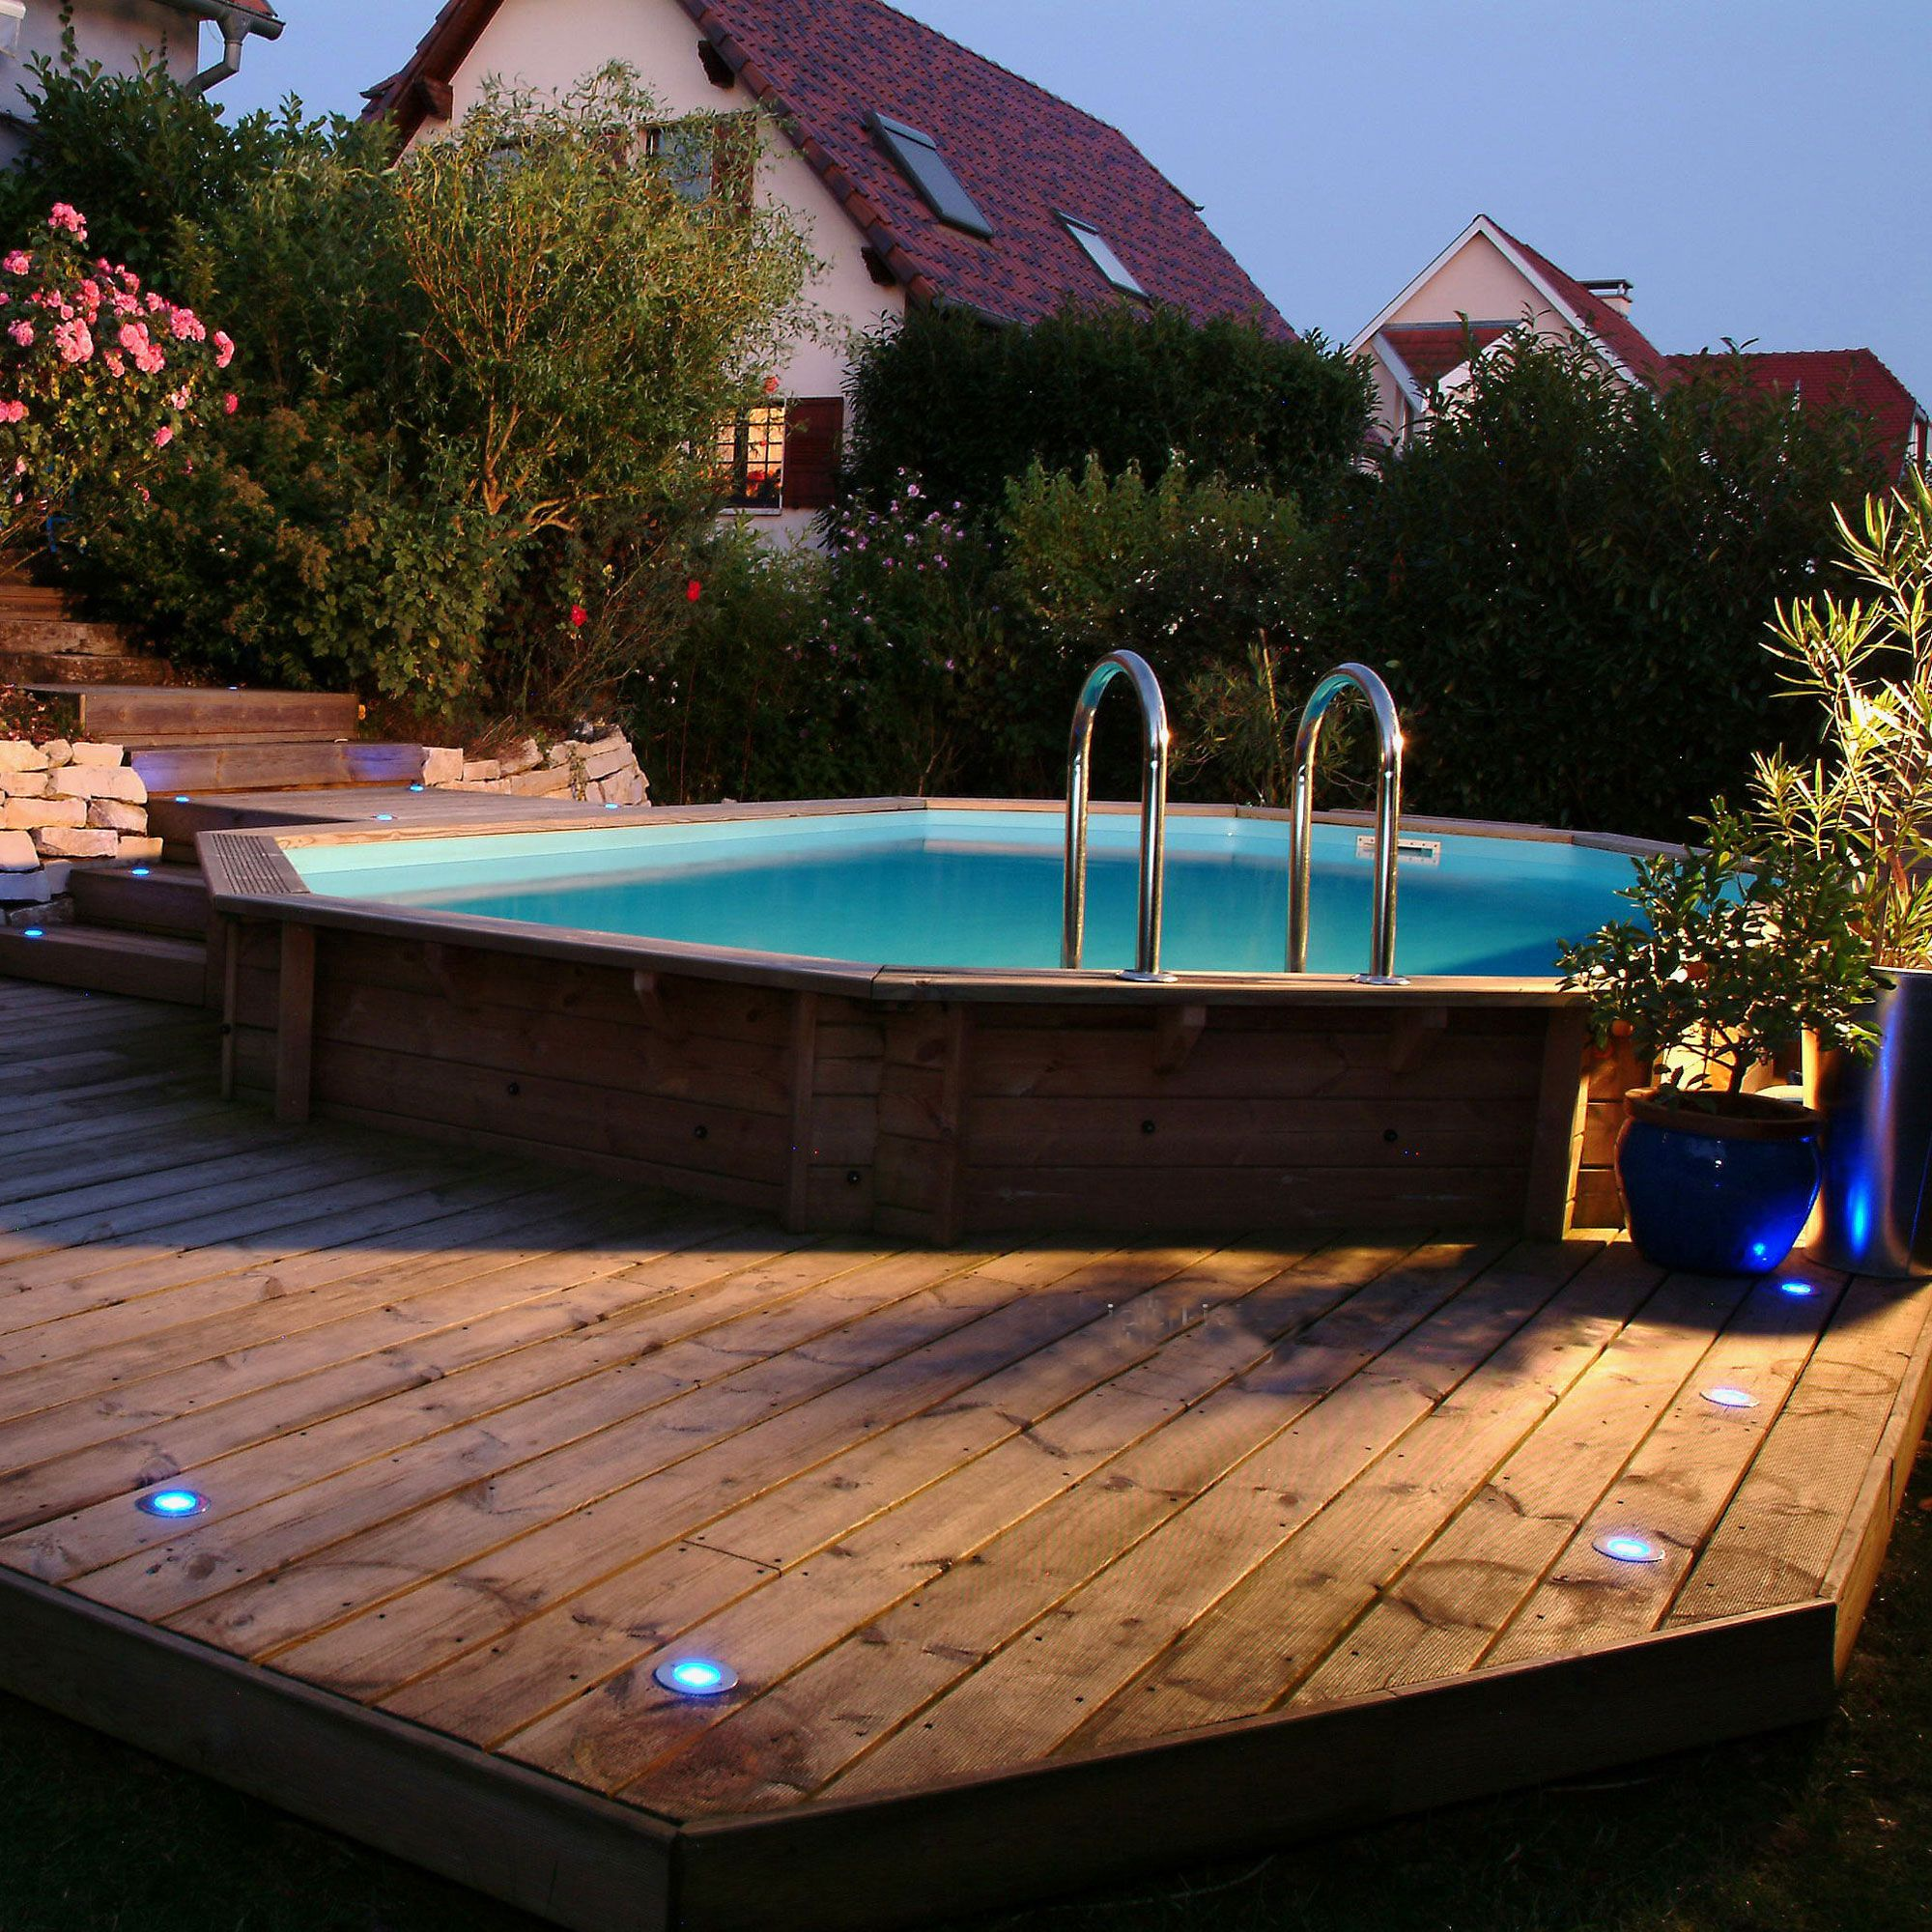 piscine hors sol bois fsc octogonale ocea ubbink piscine delamaison jardin garden. Black Bedroom Furniture Sets. Home Design Ideas